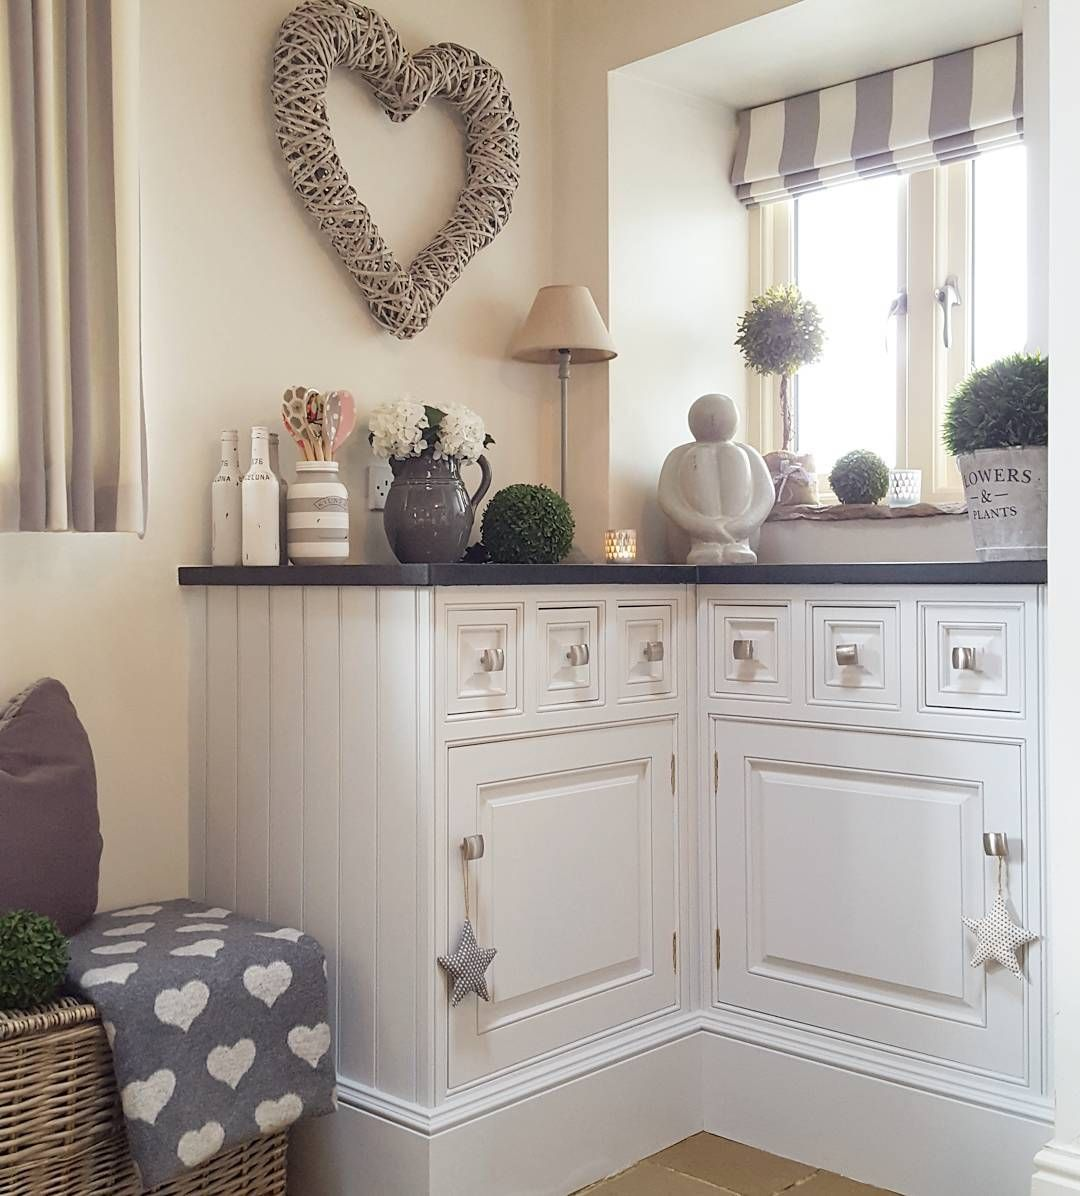 #kitchendecor #kitchencorner #countrystyle #ourhome #stripedblind #newcupboardcolour